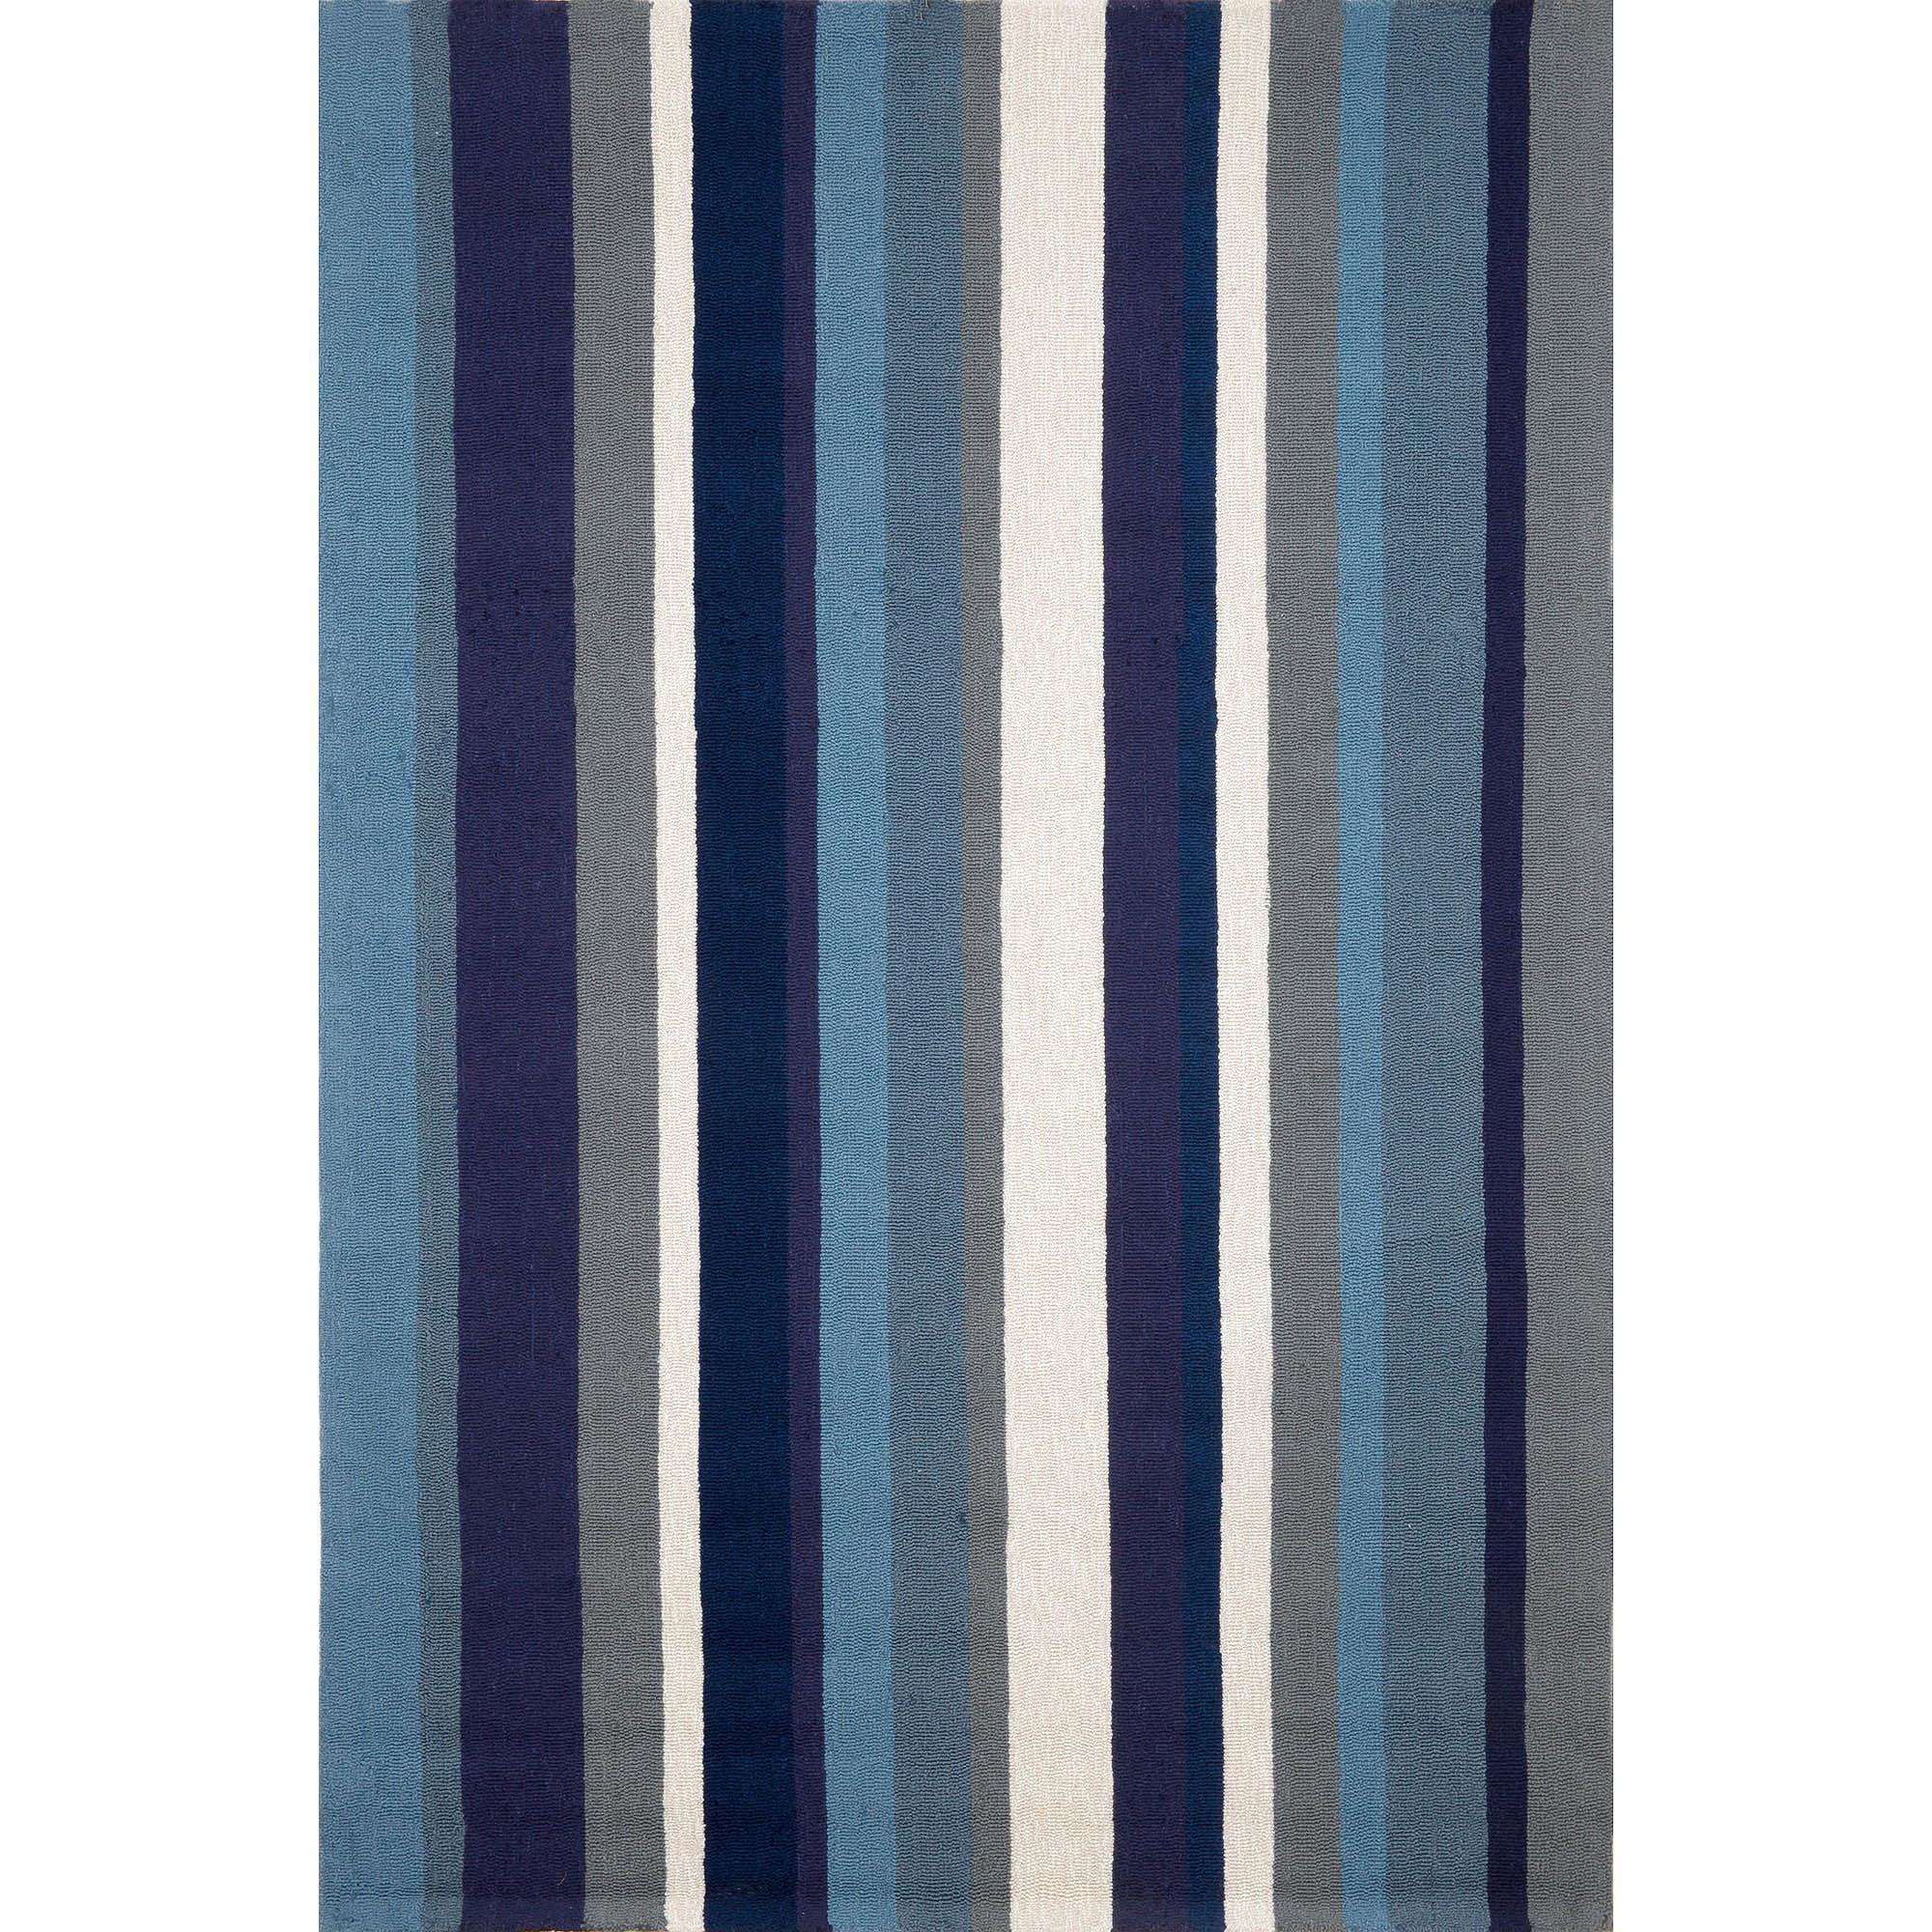 Liora Manne Newport Vertical Stripe Hand Tufted Rectangular Rugs